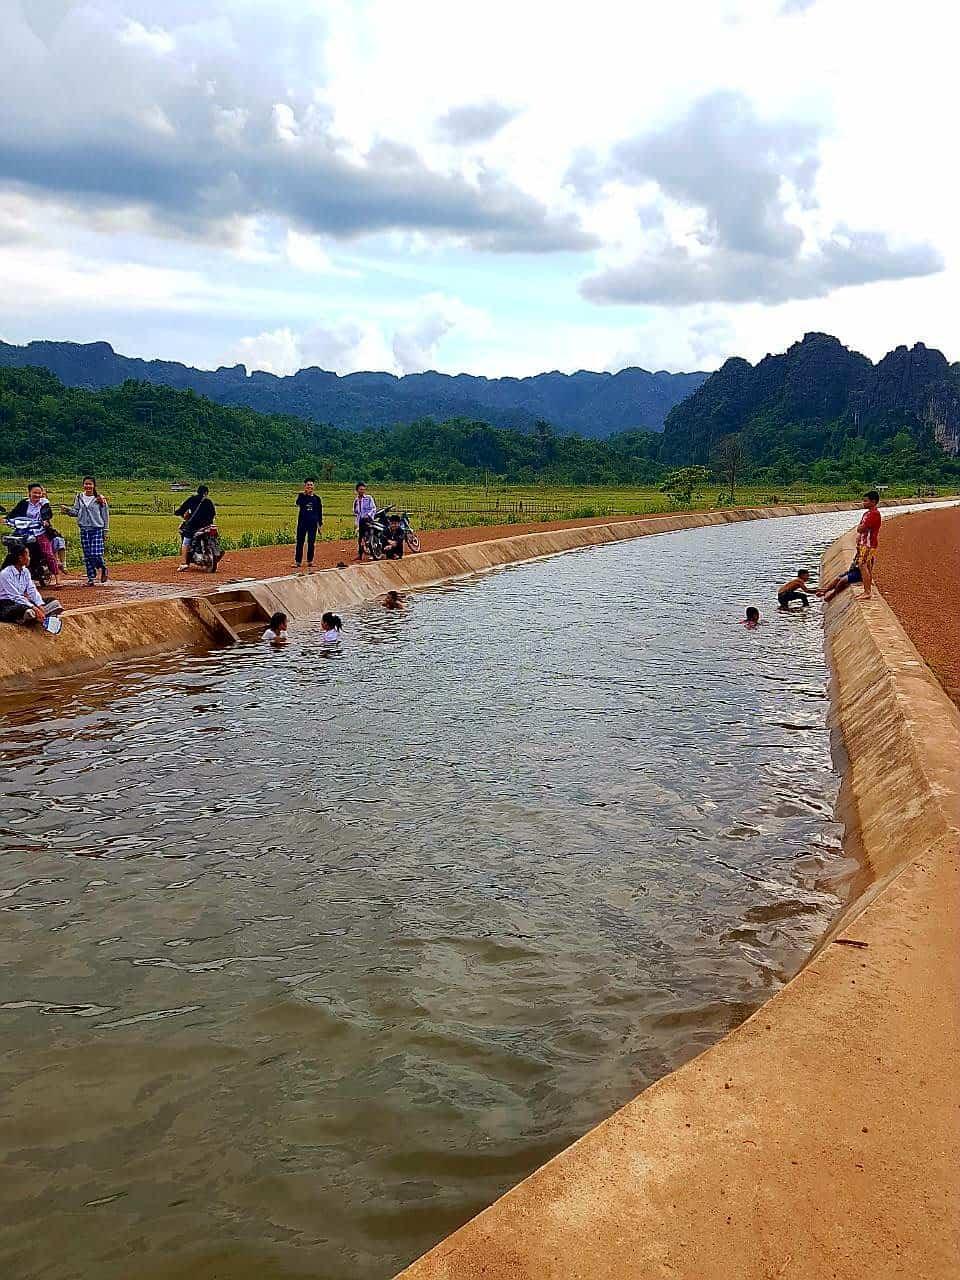 Laos, la boucle de Thakhek à moto 🛵 12